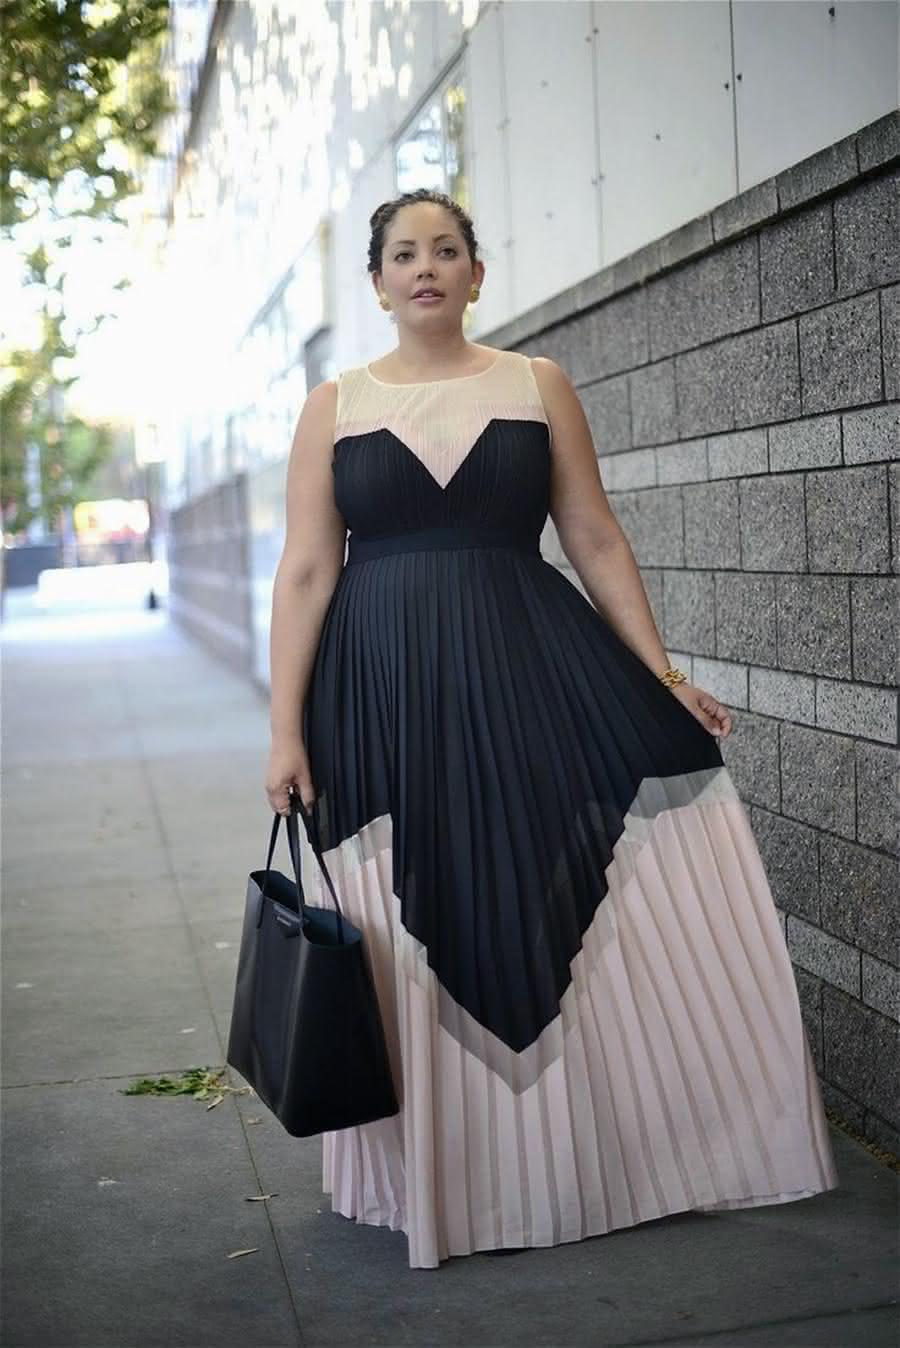 c76205f243 vestido-longo-plus-size-vestidos-longos-plus-size-vestidos-plus-size-vestido -plus-size-vestidos-longos-vestido-longo-plus-size-comprar-moda-plus-size- plus- ...